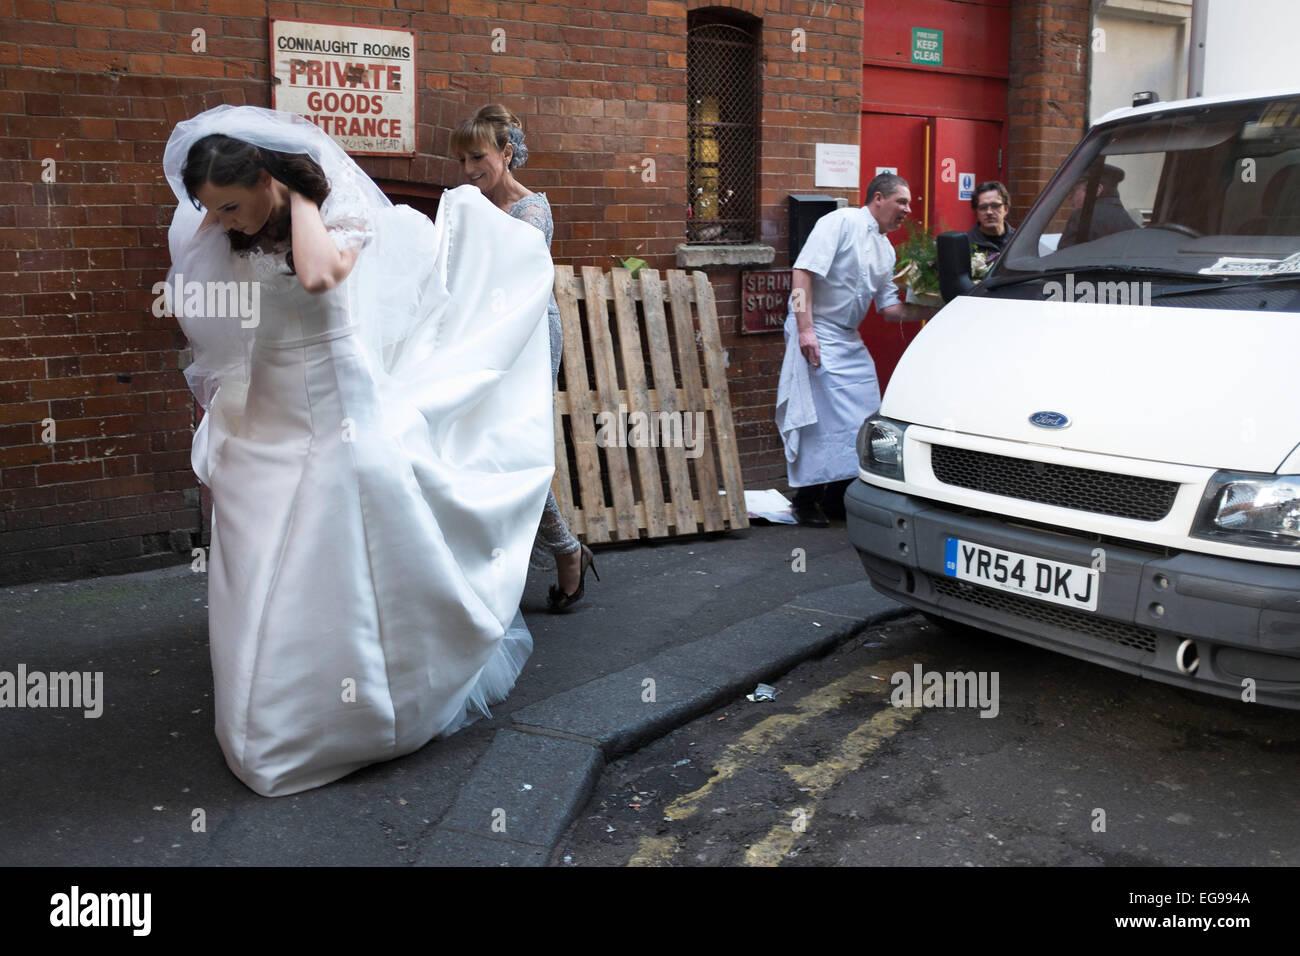 Bride arrives for her wedding in a vintage Rolls Royce, making her entrance via the 'Goods entrance' at - Stock Image